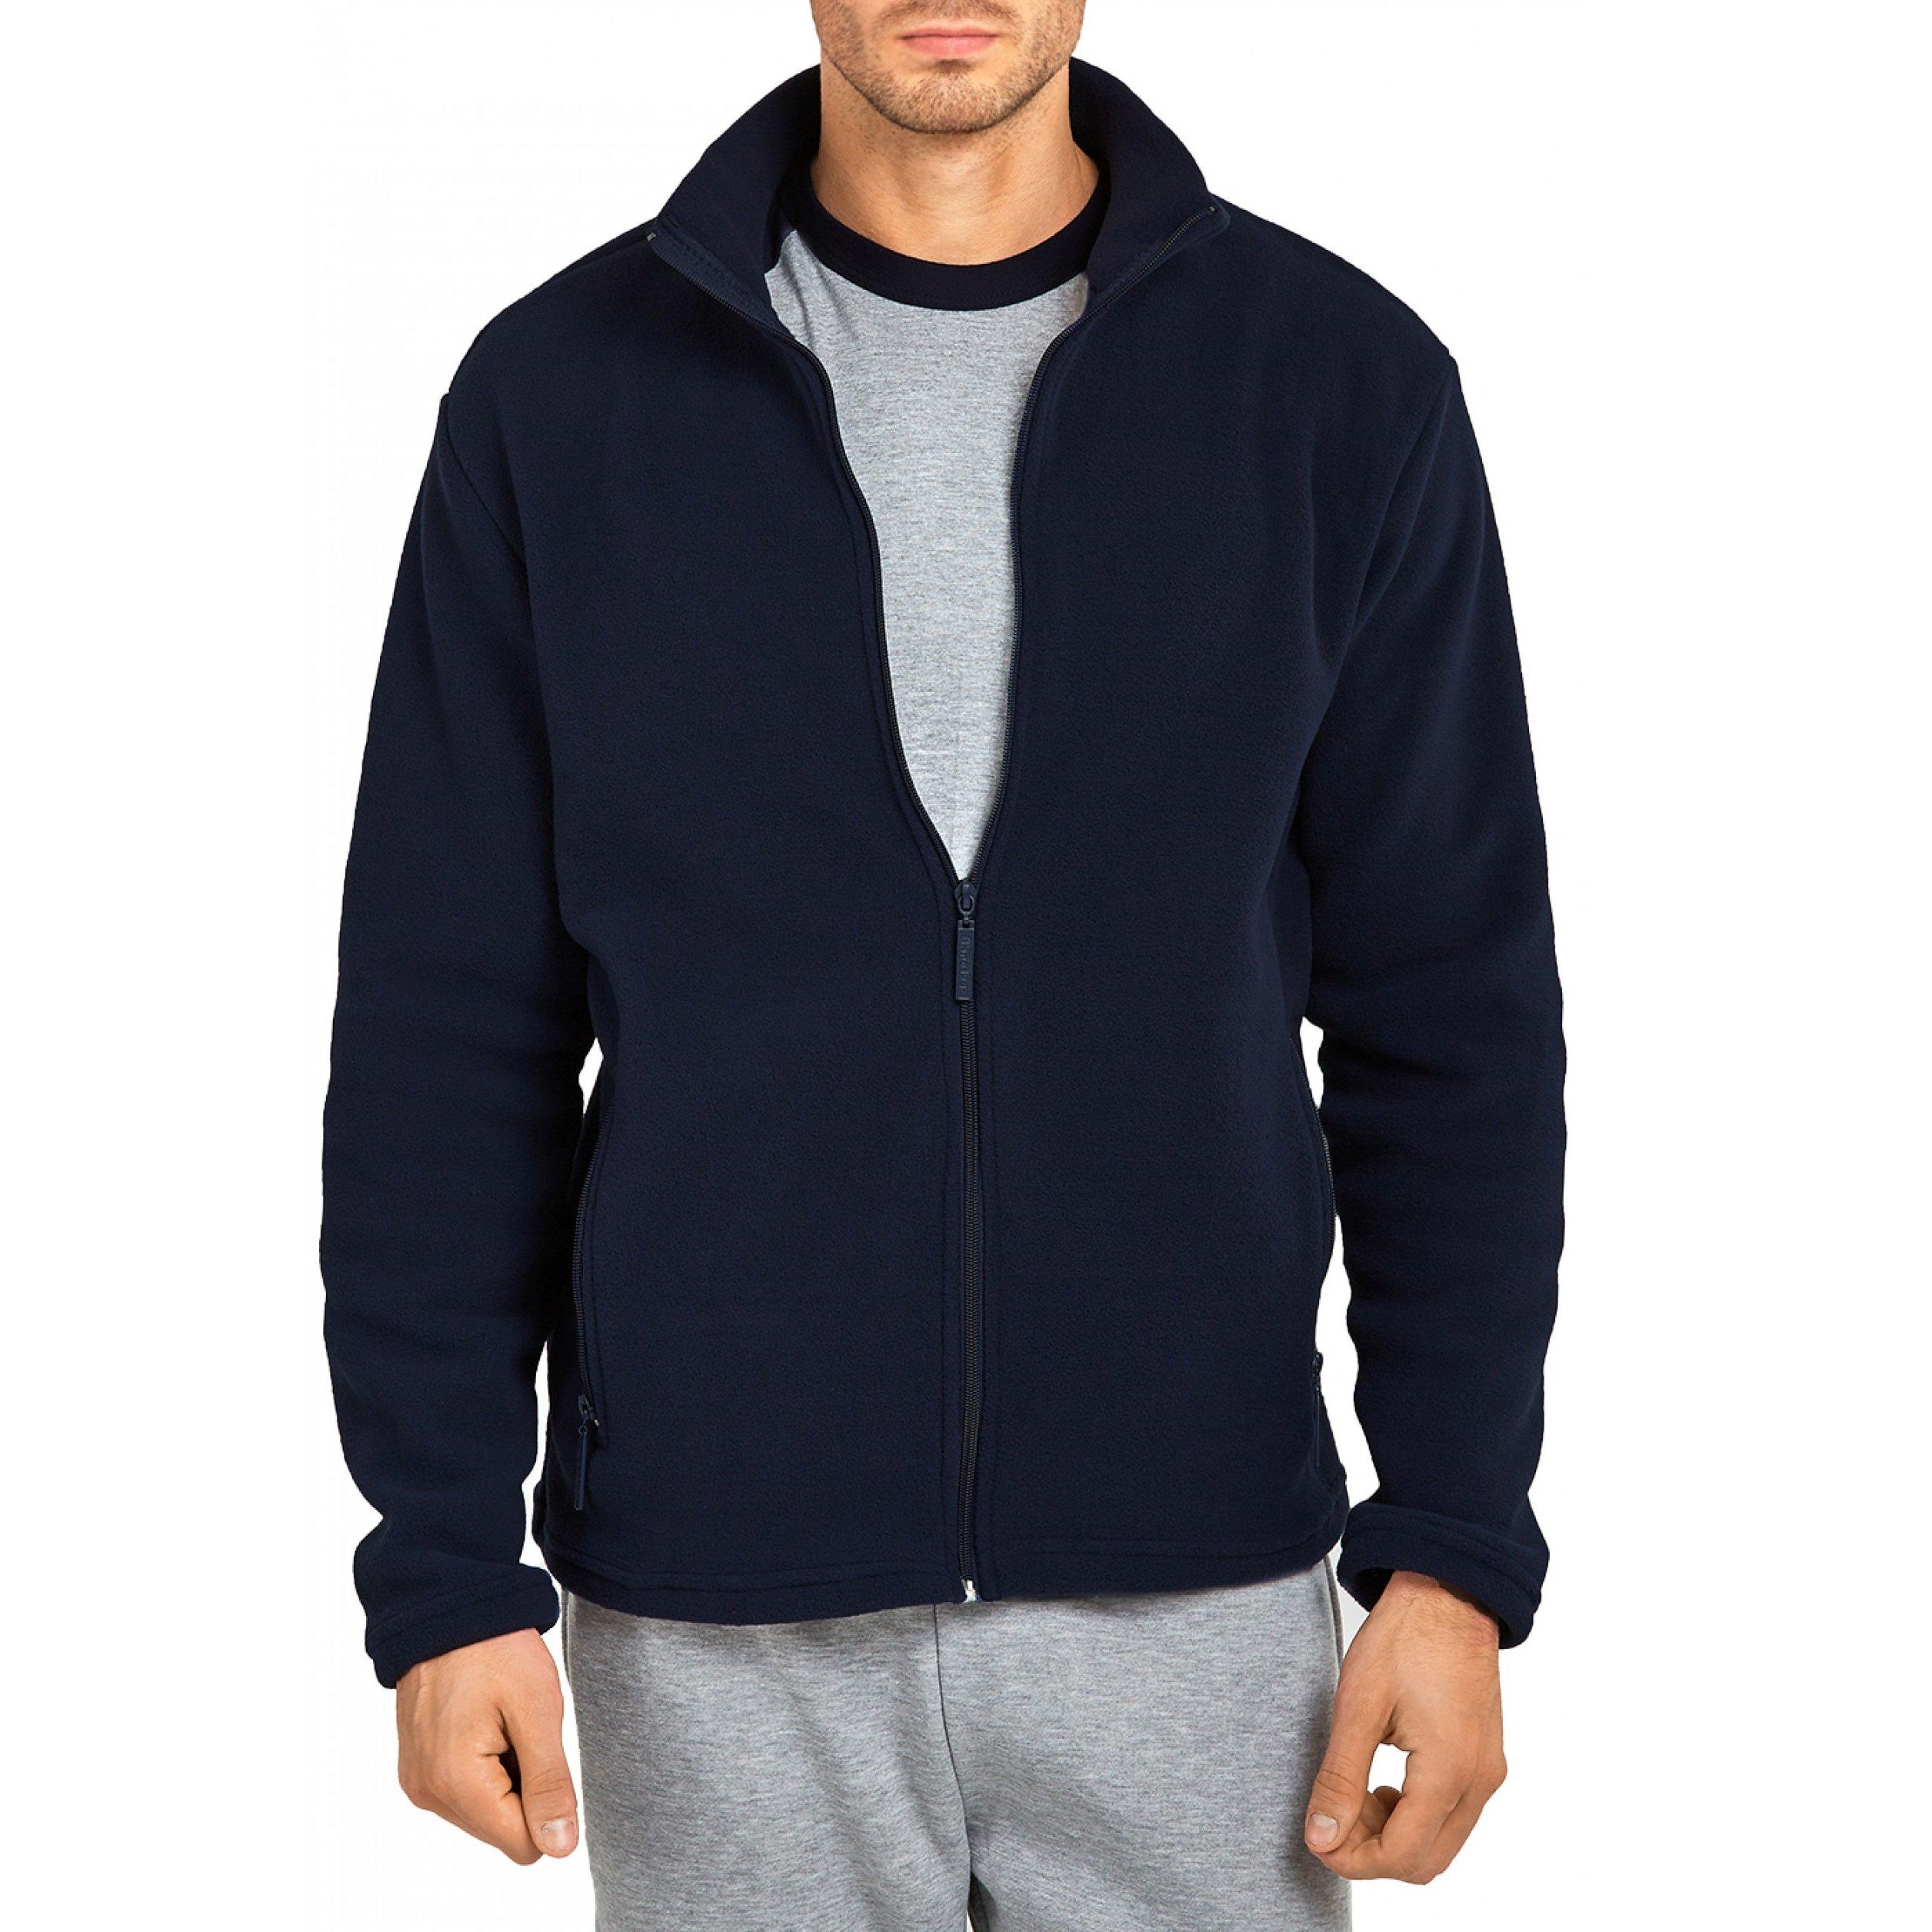 Mechaly Men Classic Full Zip Long Sleeve Polyester Polar Fleece Jacket (Navy, Large)